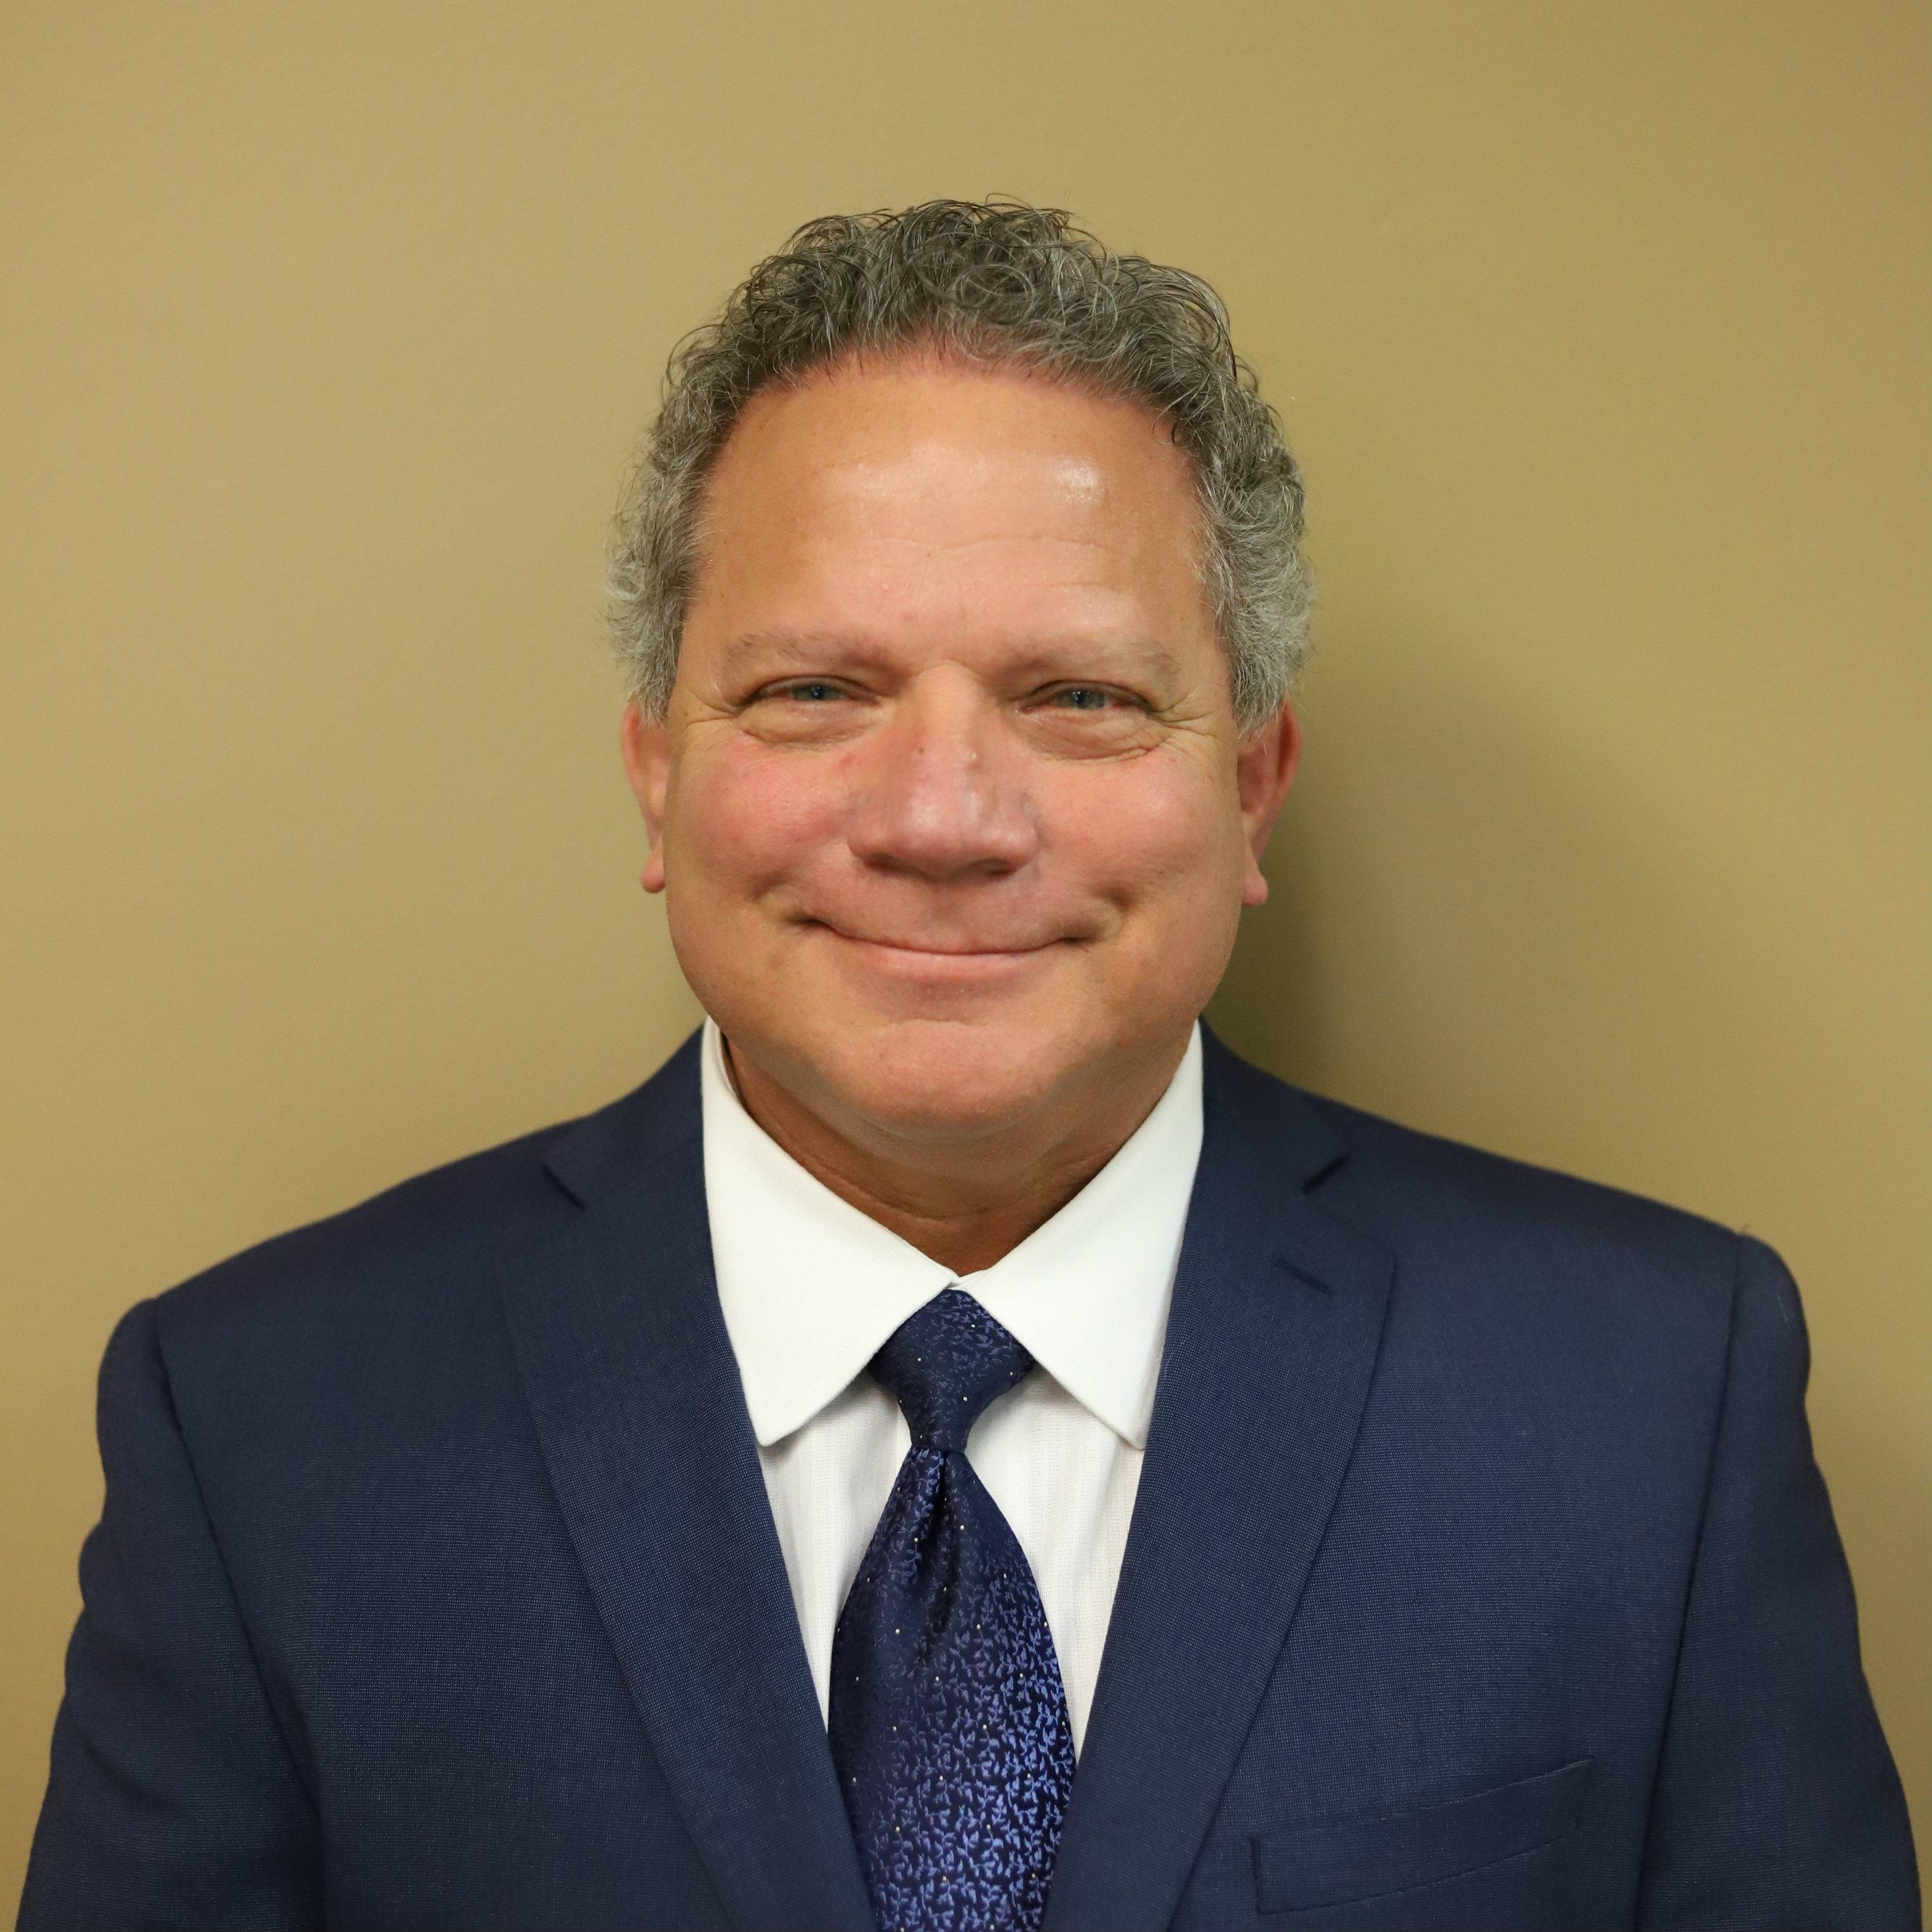 C. Wayne Cook, Mellberg Wealth Management